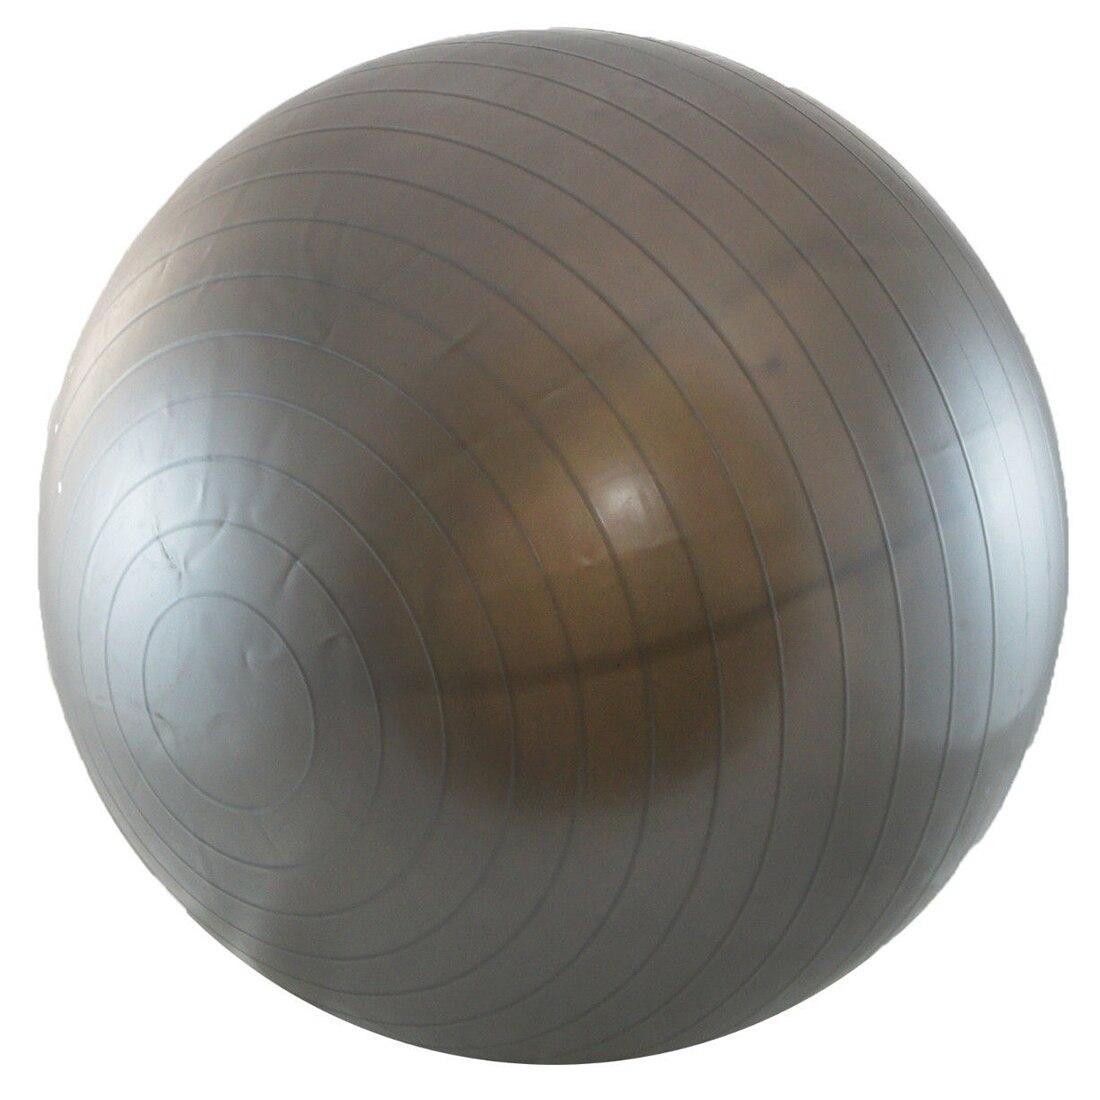 Balancing Stability Ball for Yoga Pilates Anti-Burst